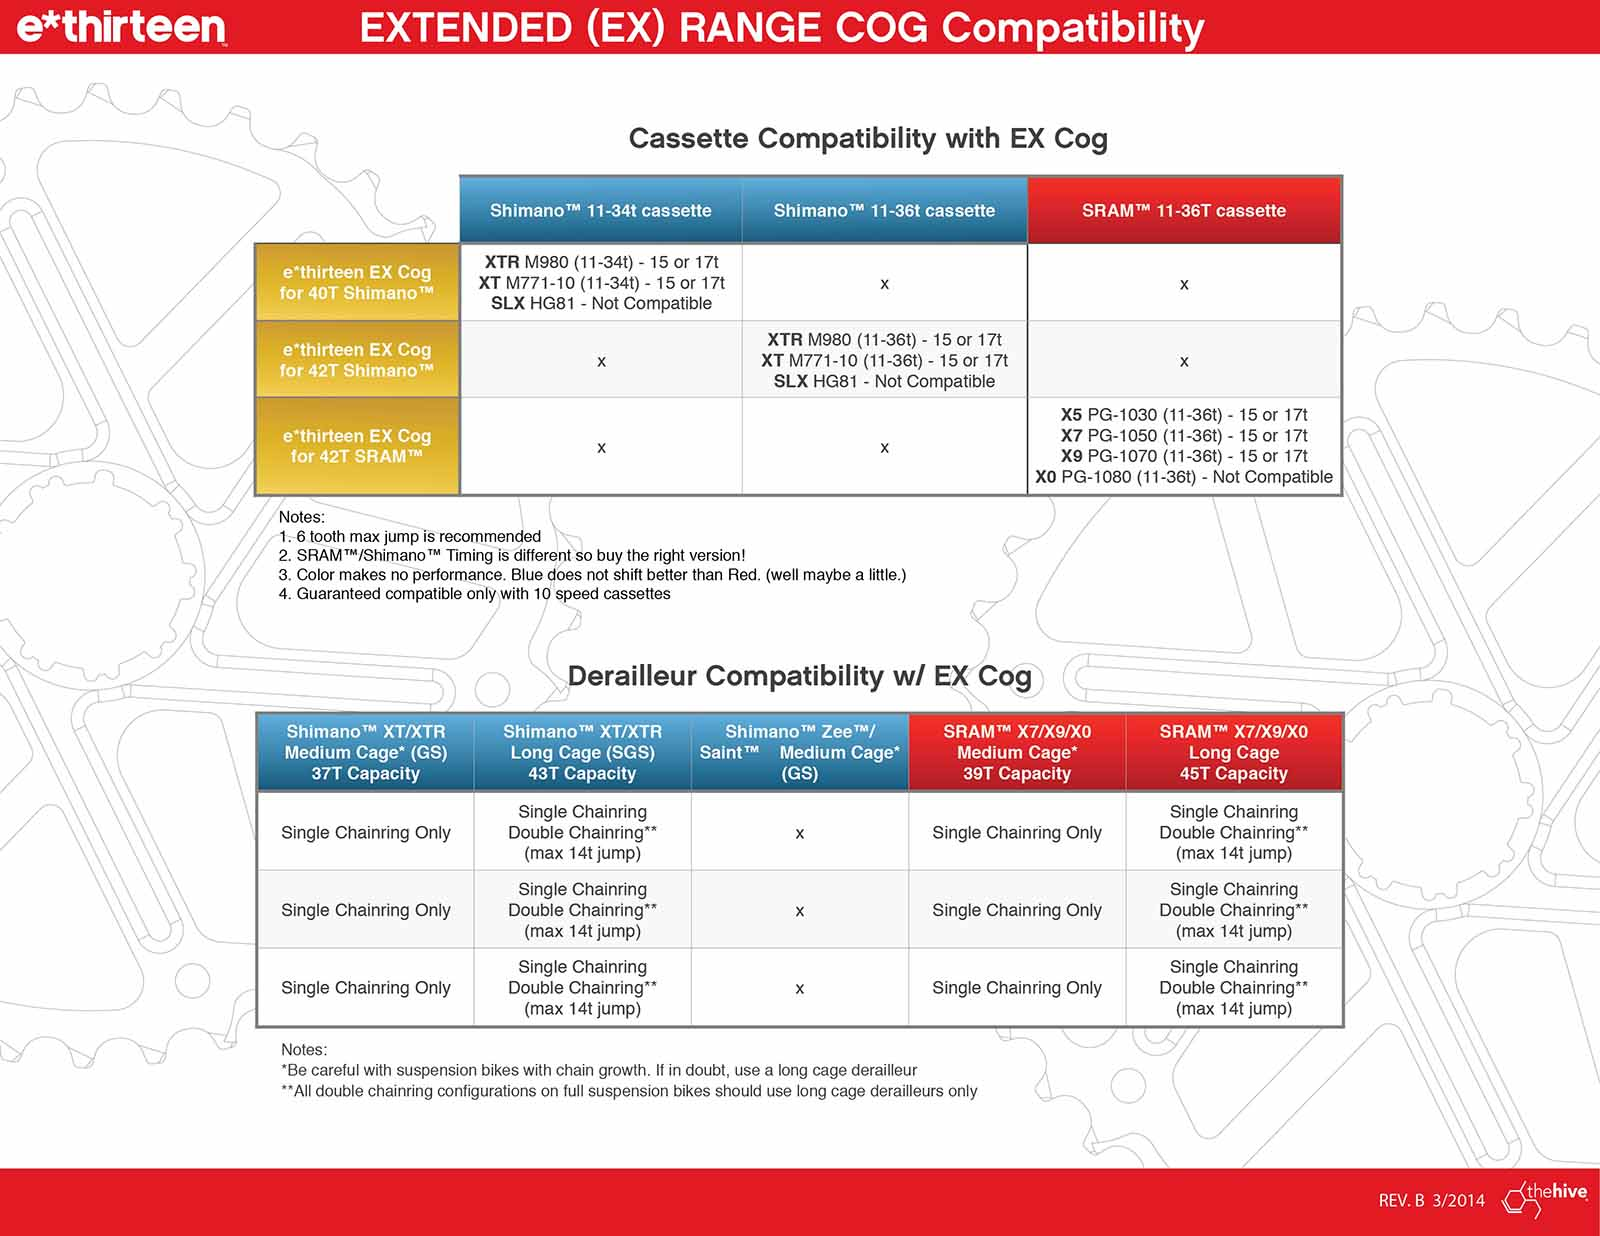 Extended Range Cog Compatibility_B